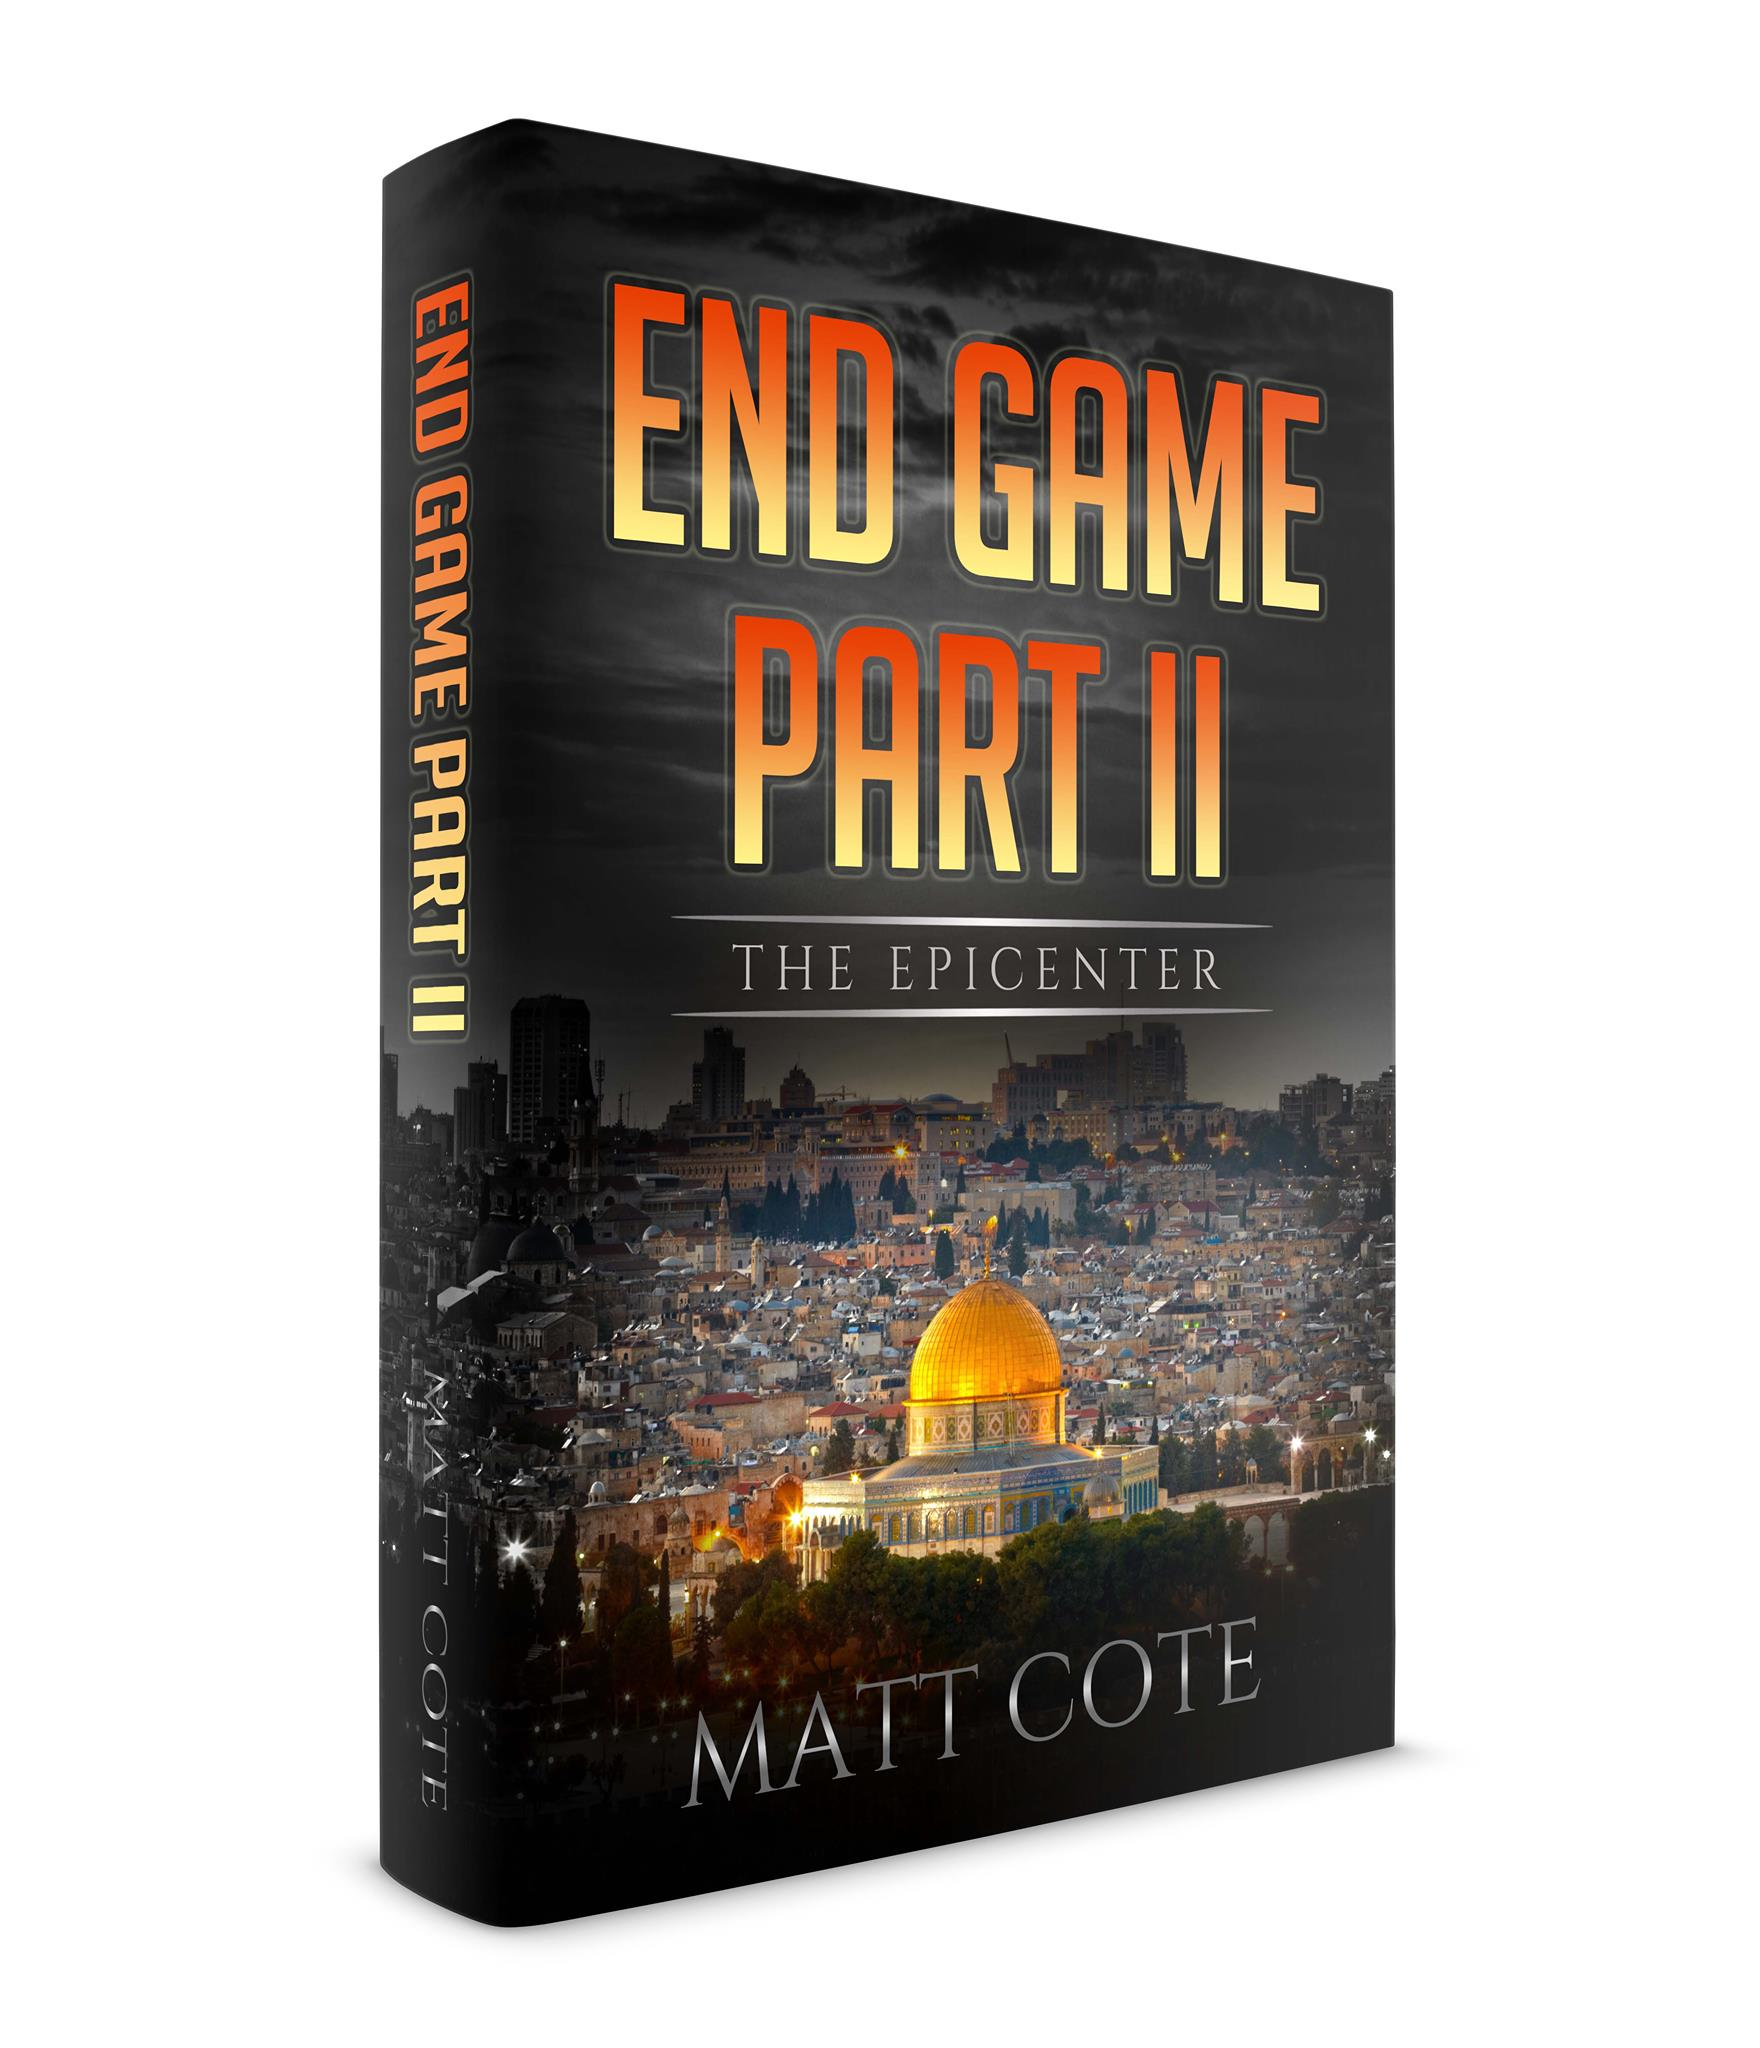 Matt Cote - Author + Writer - End Game Part II